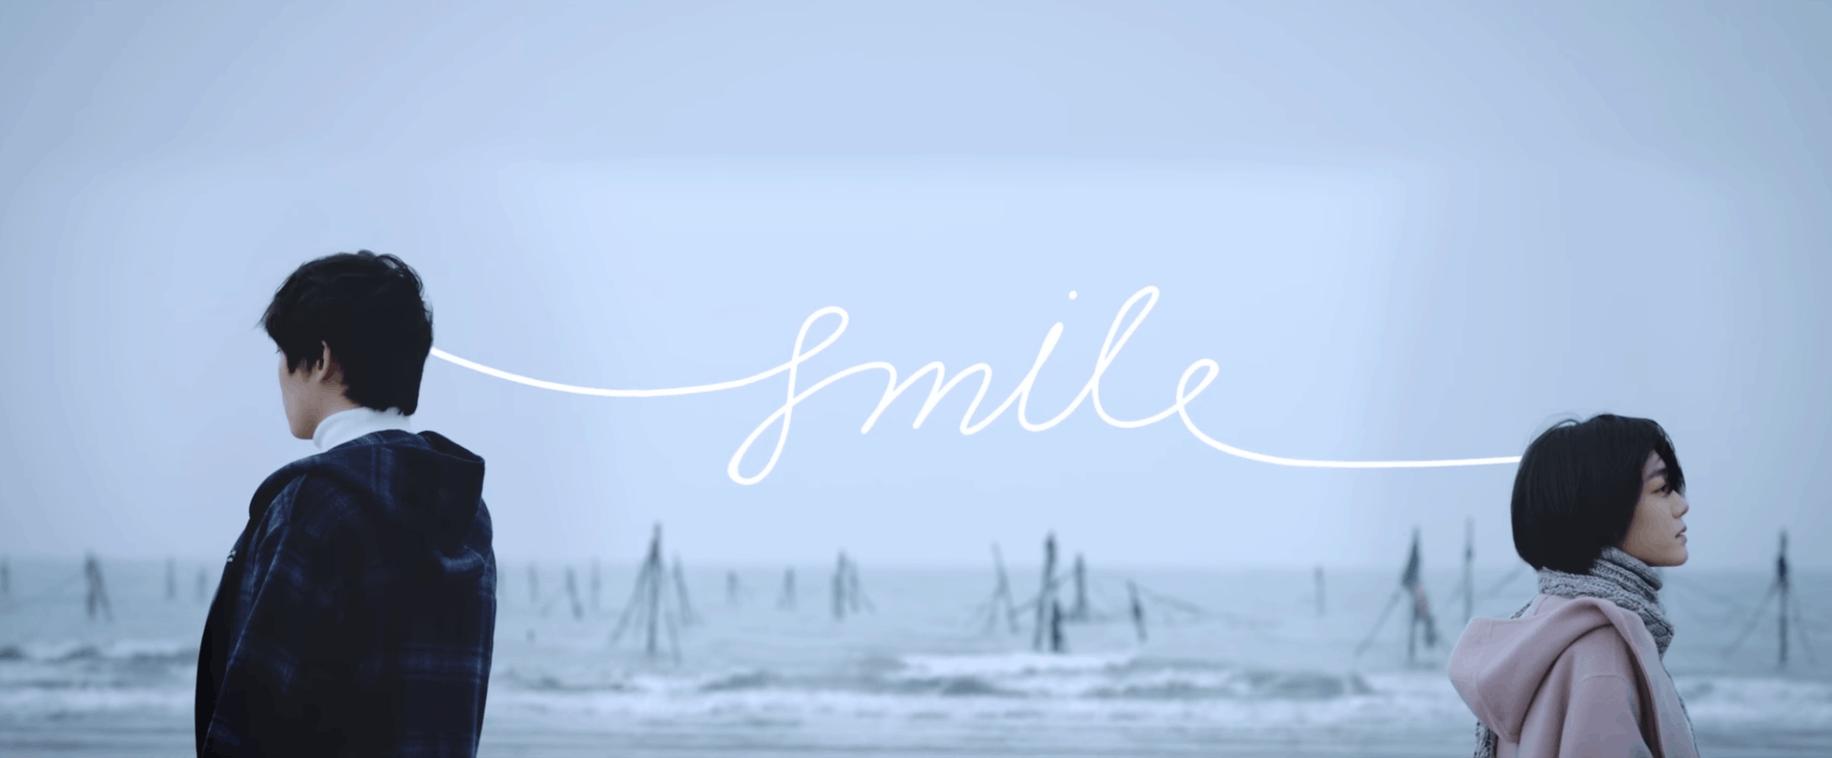 John Park smile video fashion